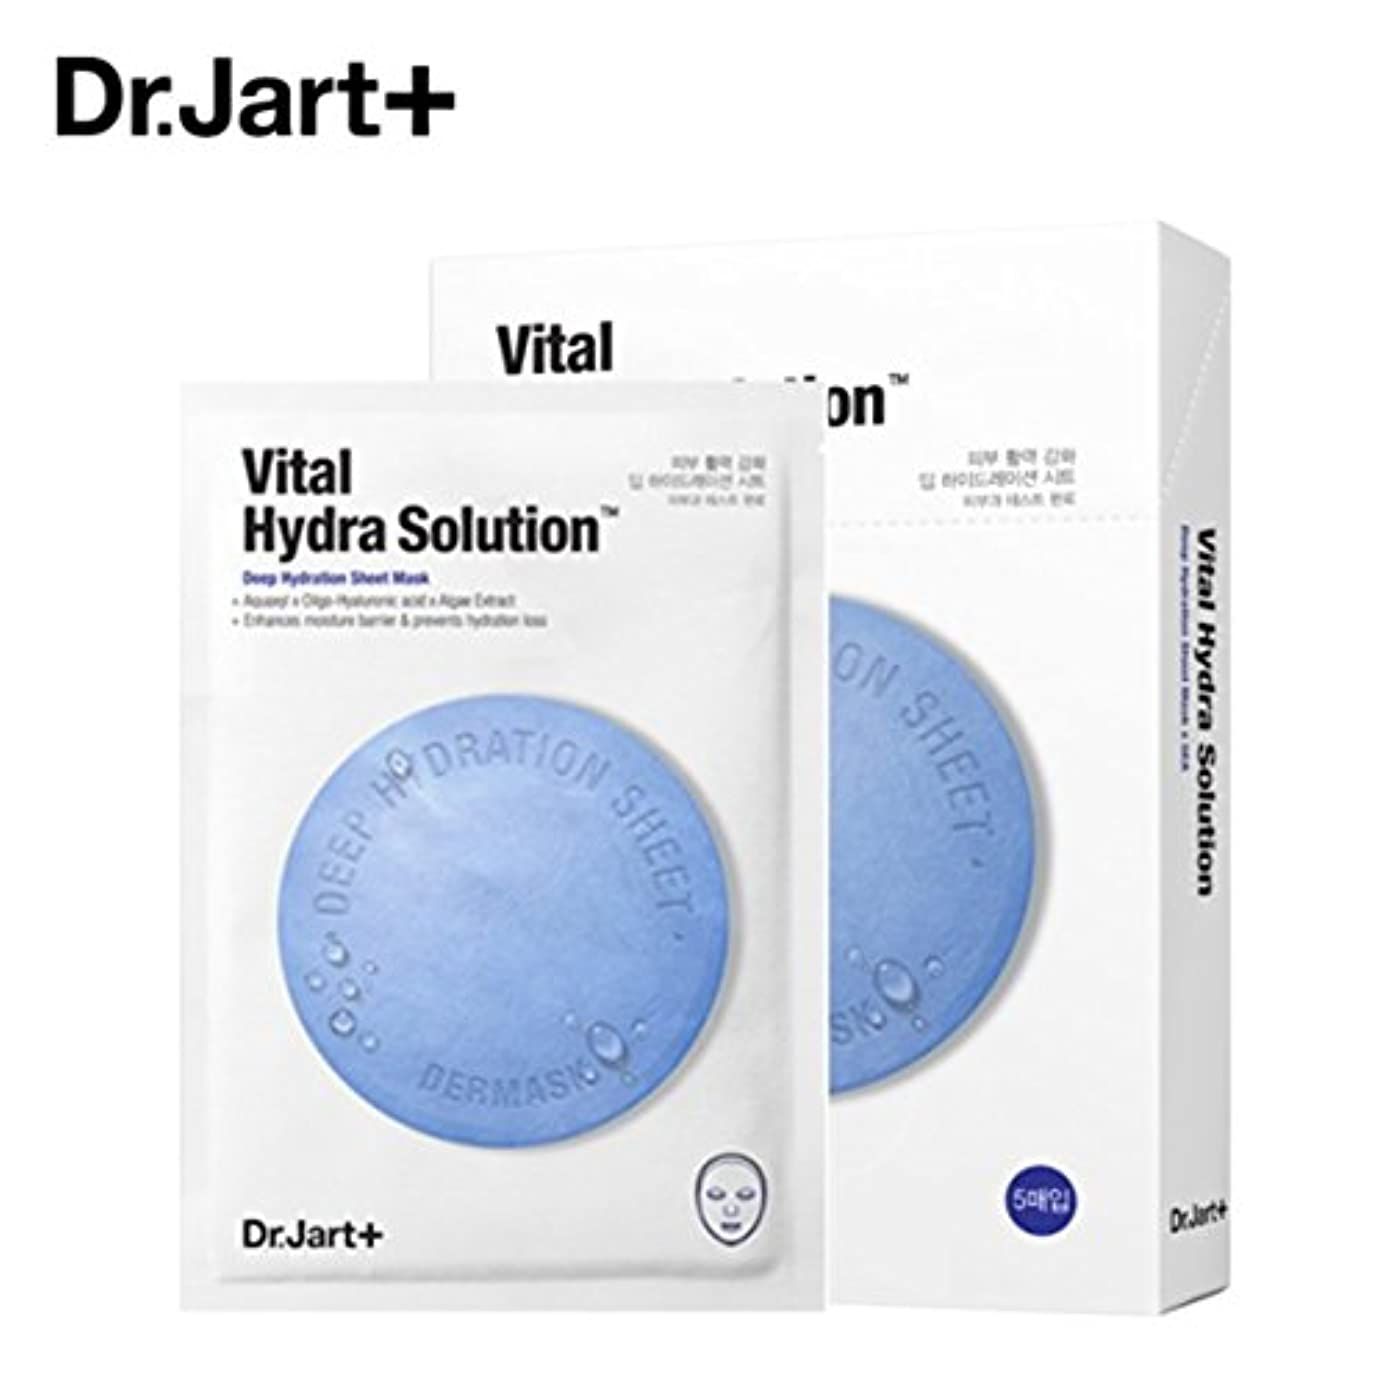 Dr.Jart+/ドクタージャルト ドクタージャルト ダーマスク ウォータージェット バイタルハイドラソリューション 5枚 (Dr.Jart+ DERMASK WATER JET VITAL HYDRA SOLUTION...